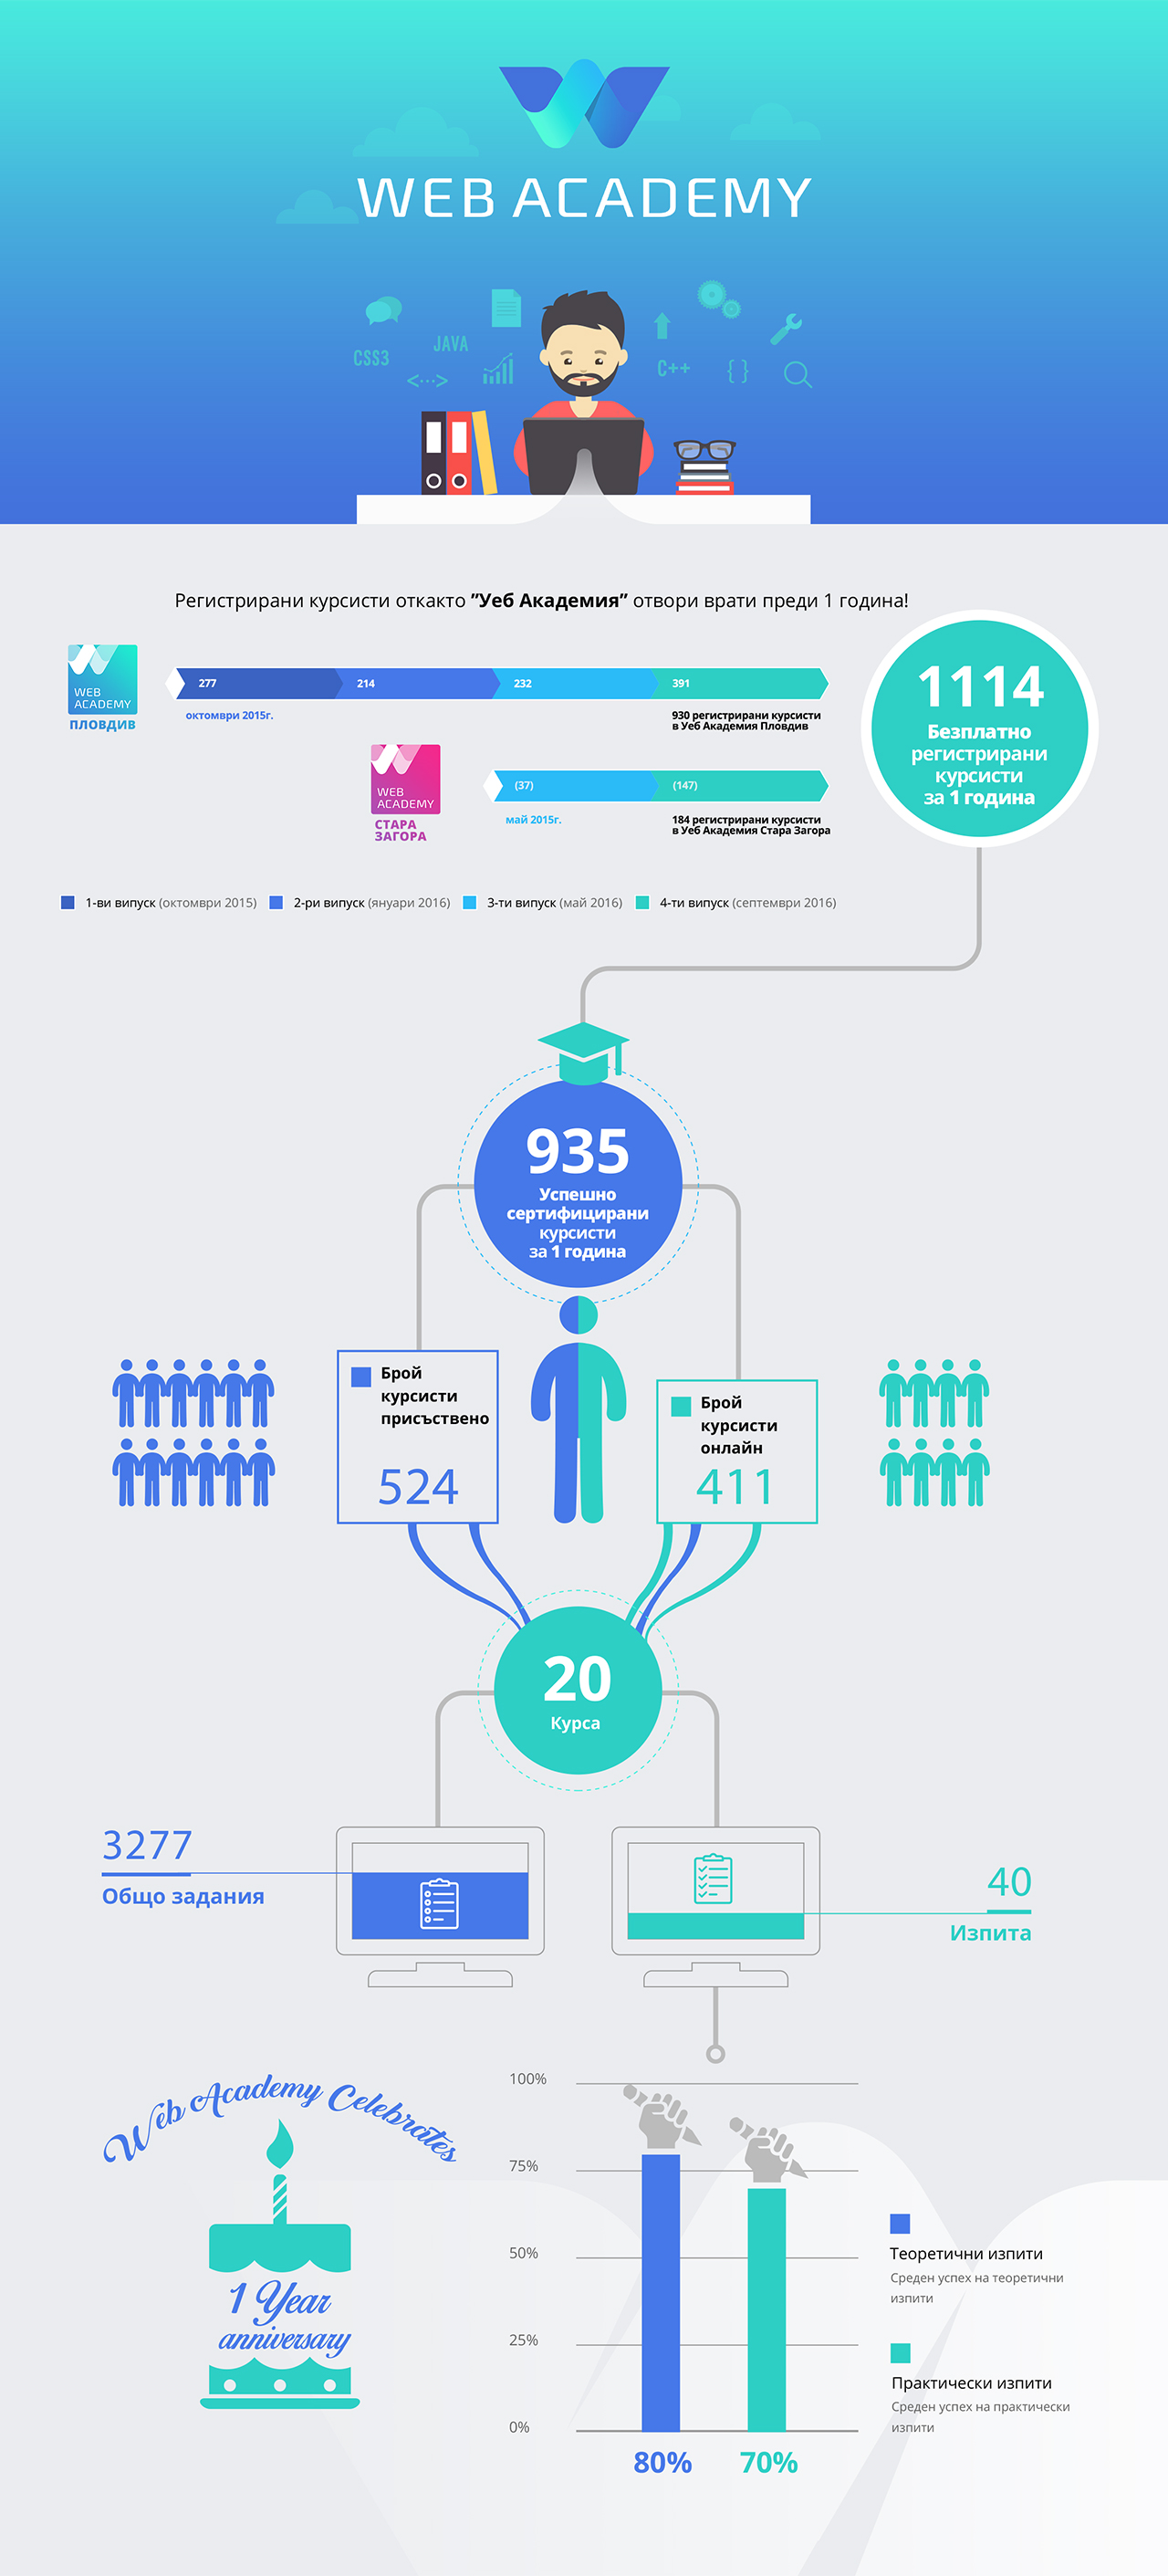 Web Academy Infographic BG